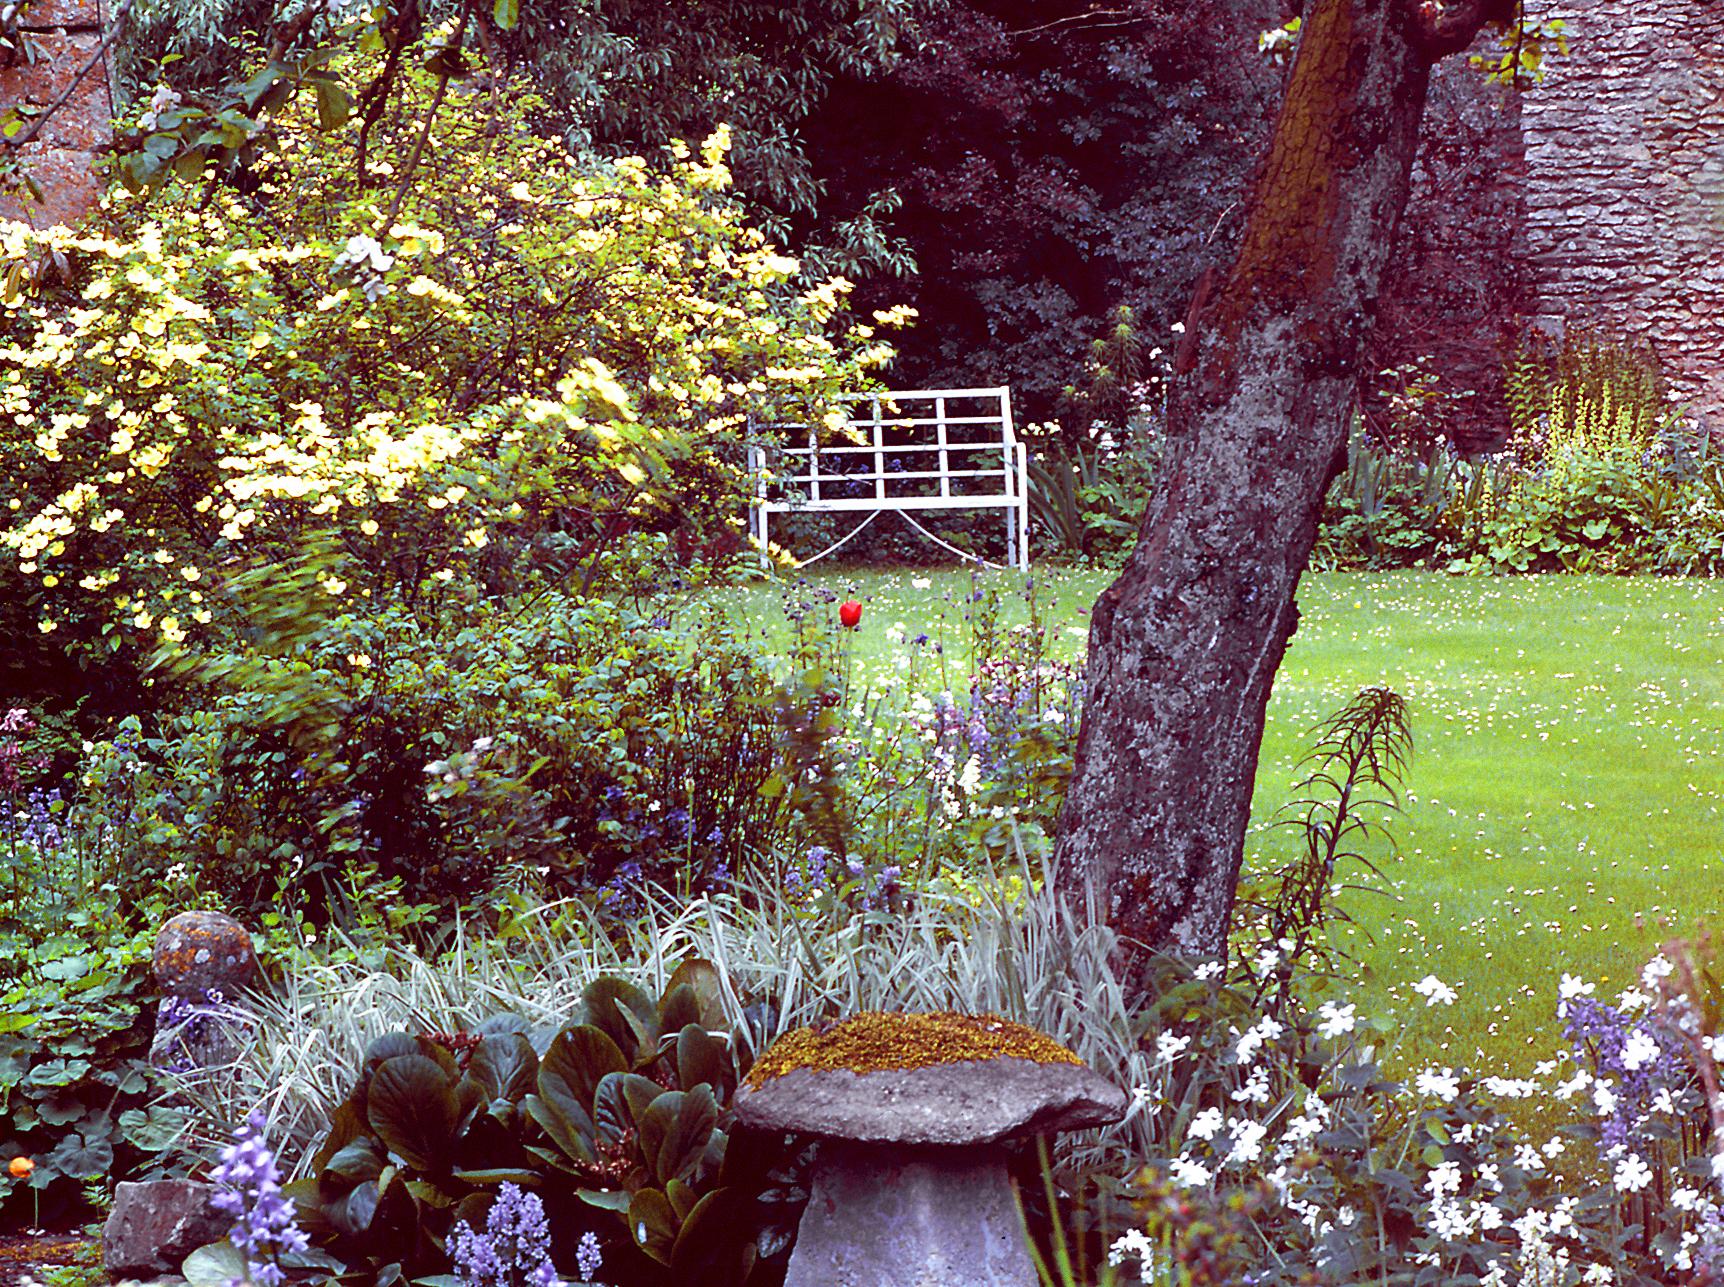 Filkins Garden Gardenvisit.com